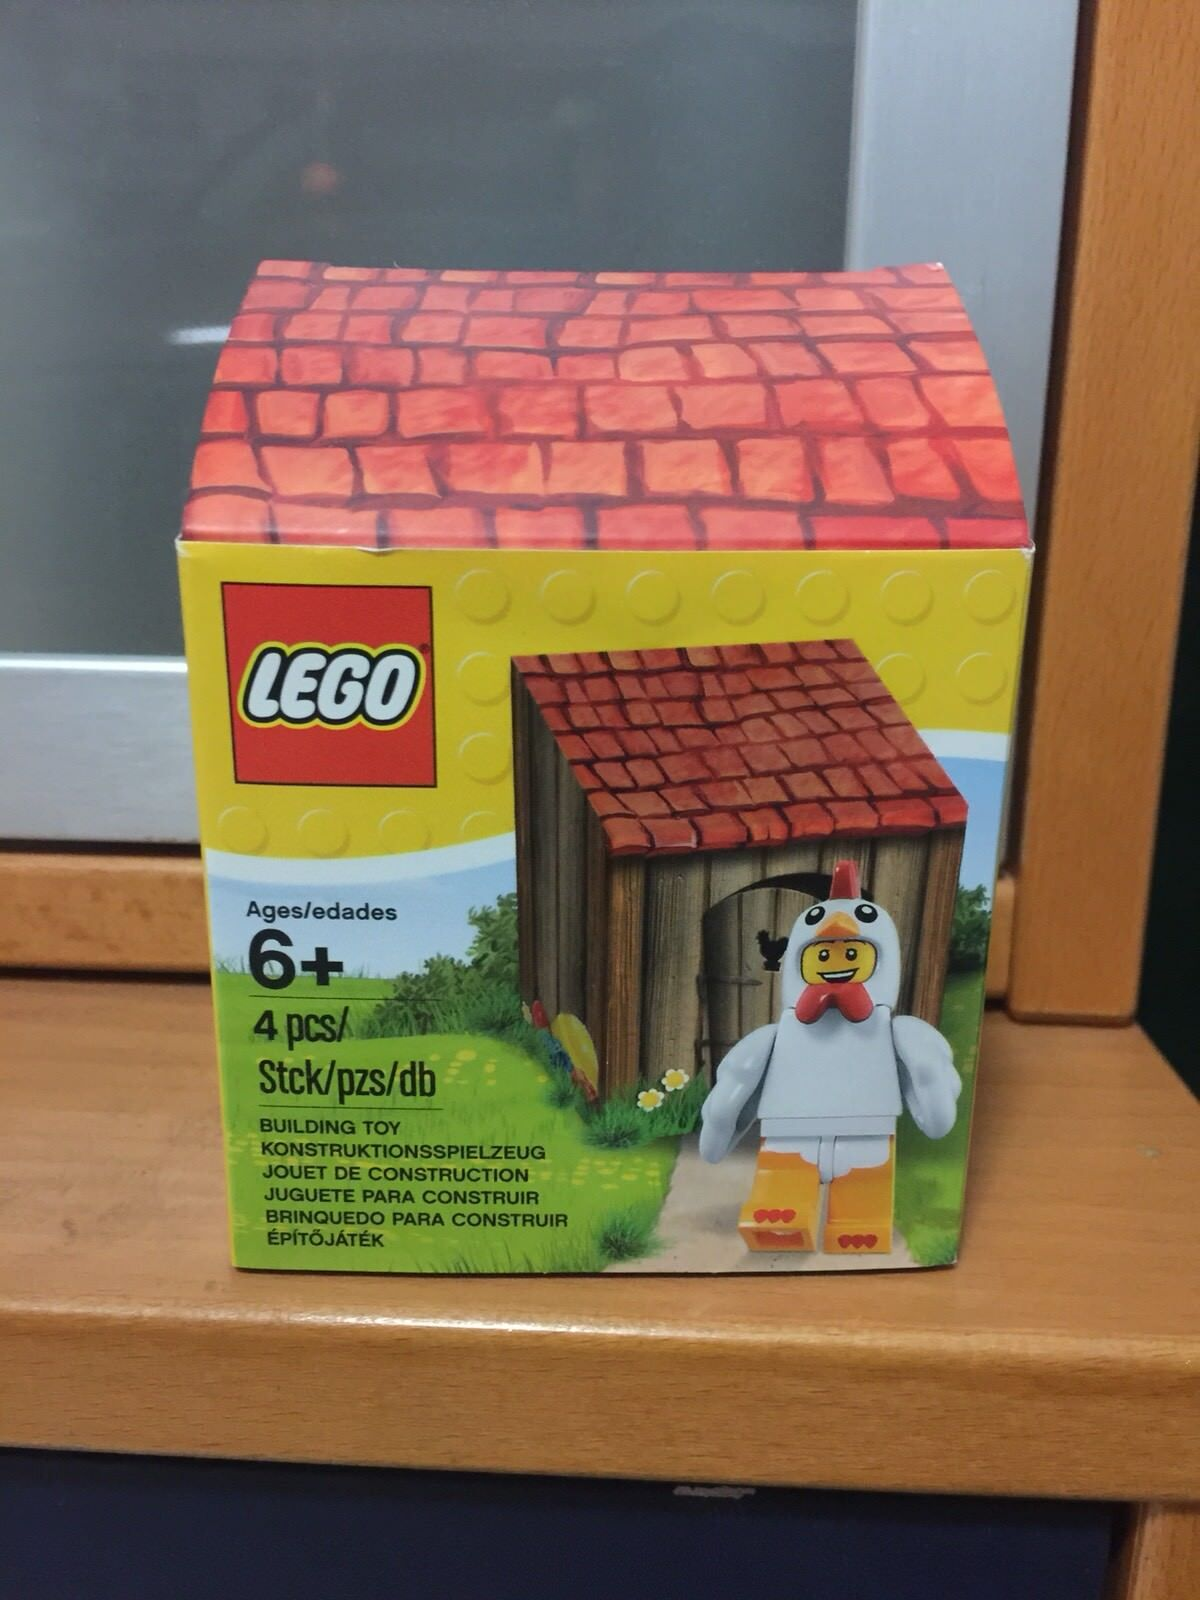 Lote de 12 nuevo traje de pollo Lego tipo Pascua Minifigure Set 5004468 serie 9